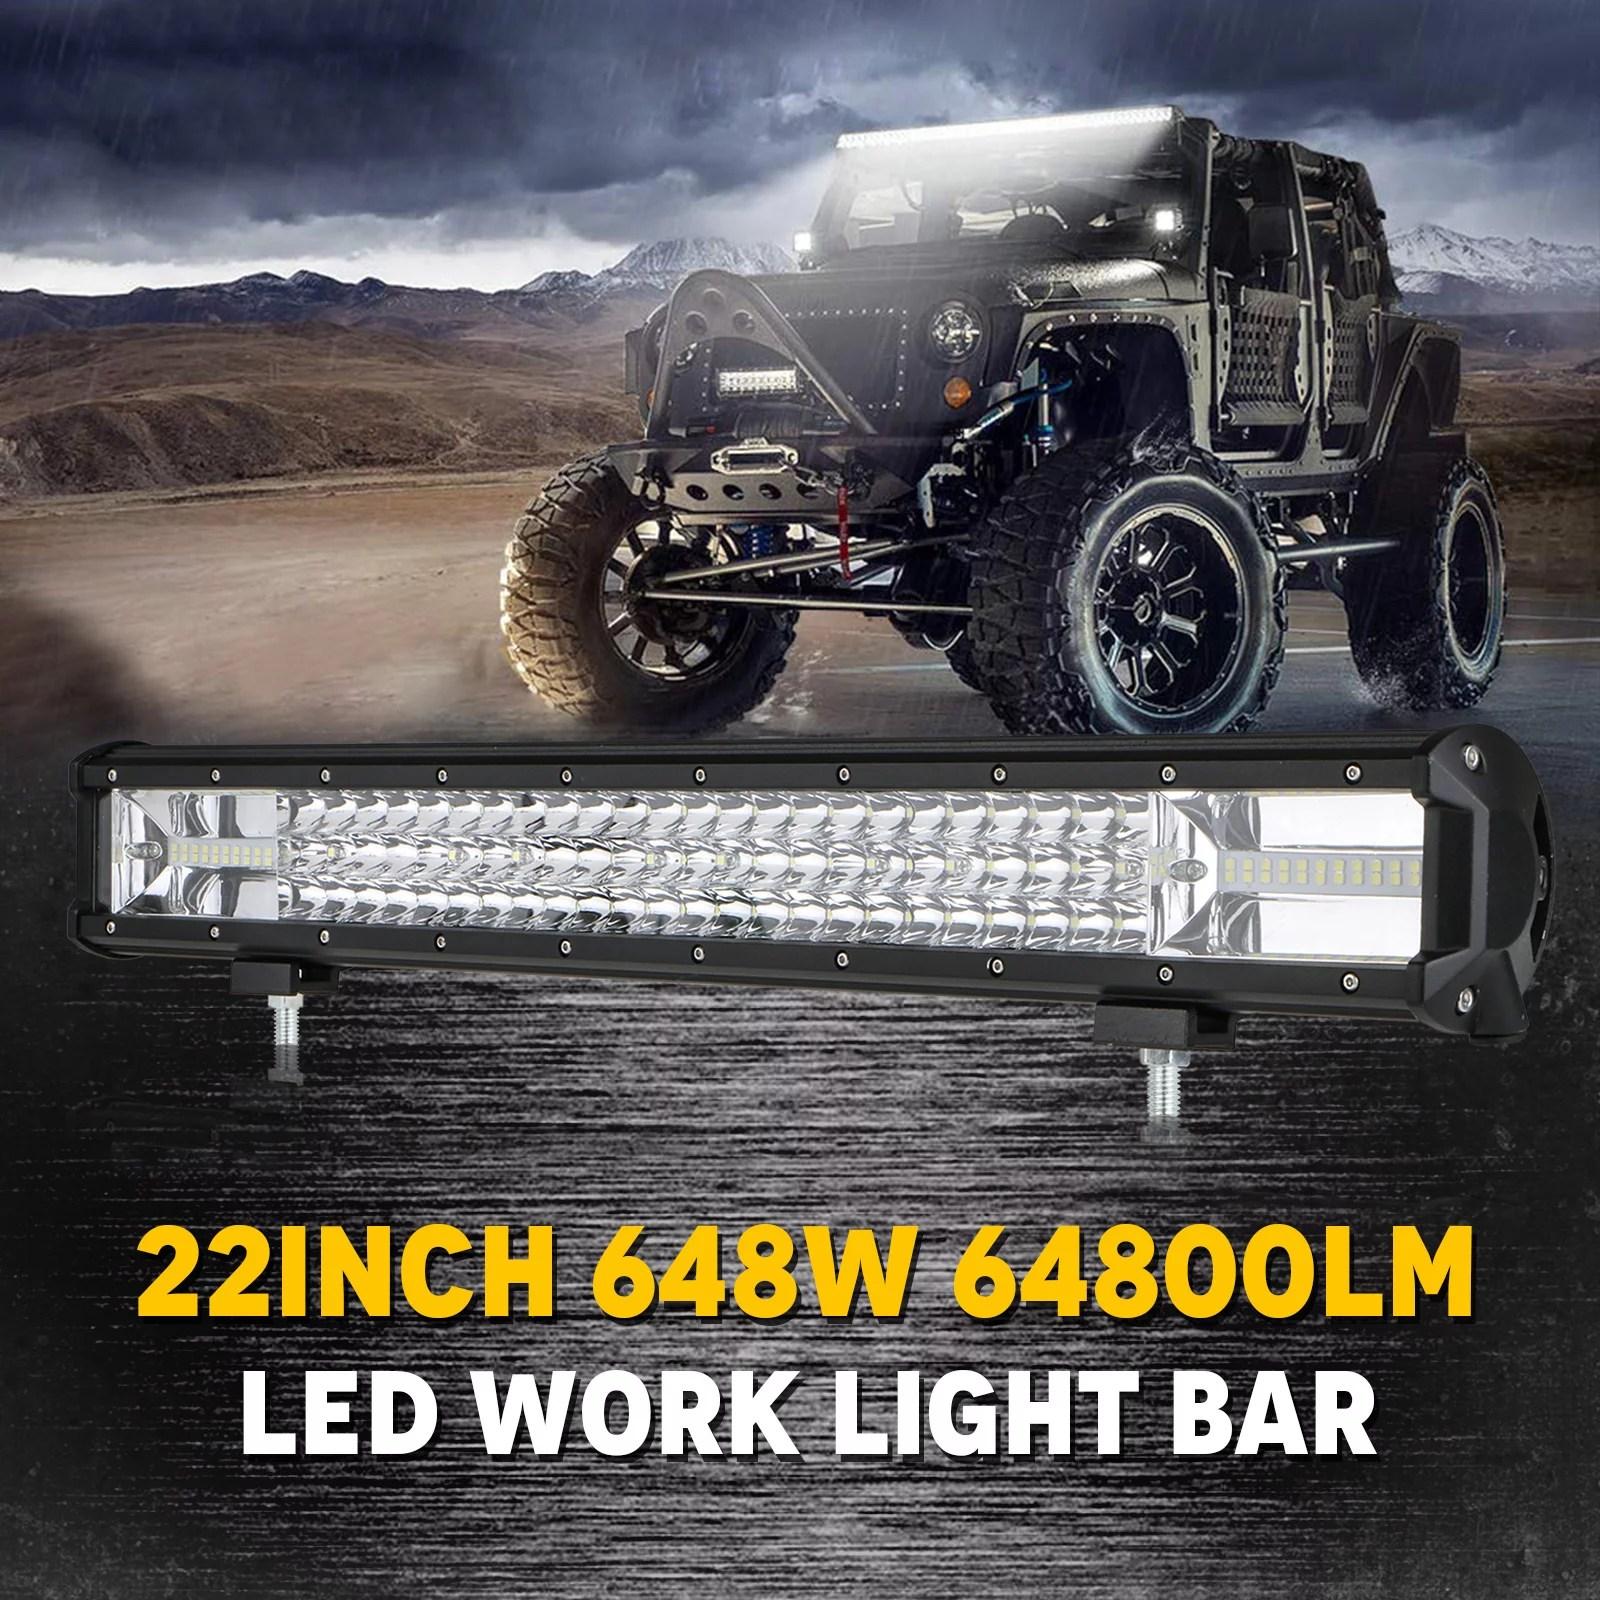 108 Wiring Harness For Atv Tsv 22inch Led Light Bar 108w Off Road Driving Lights Led